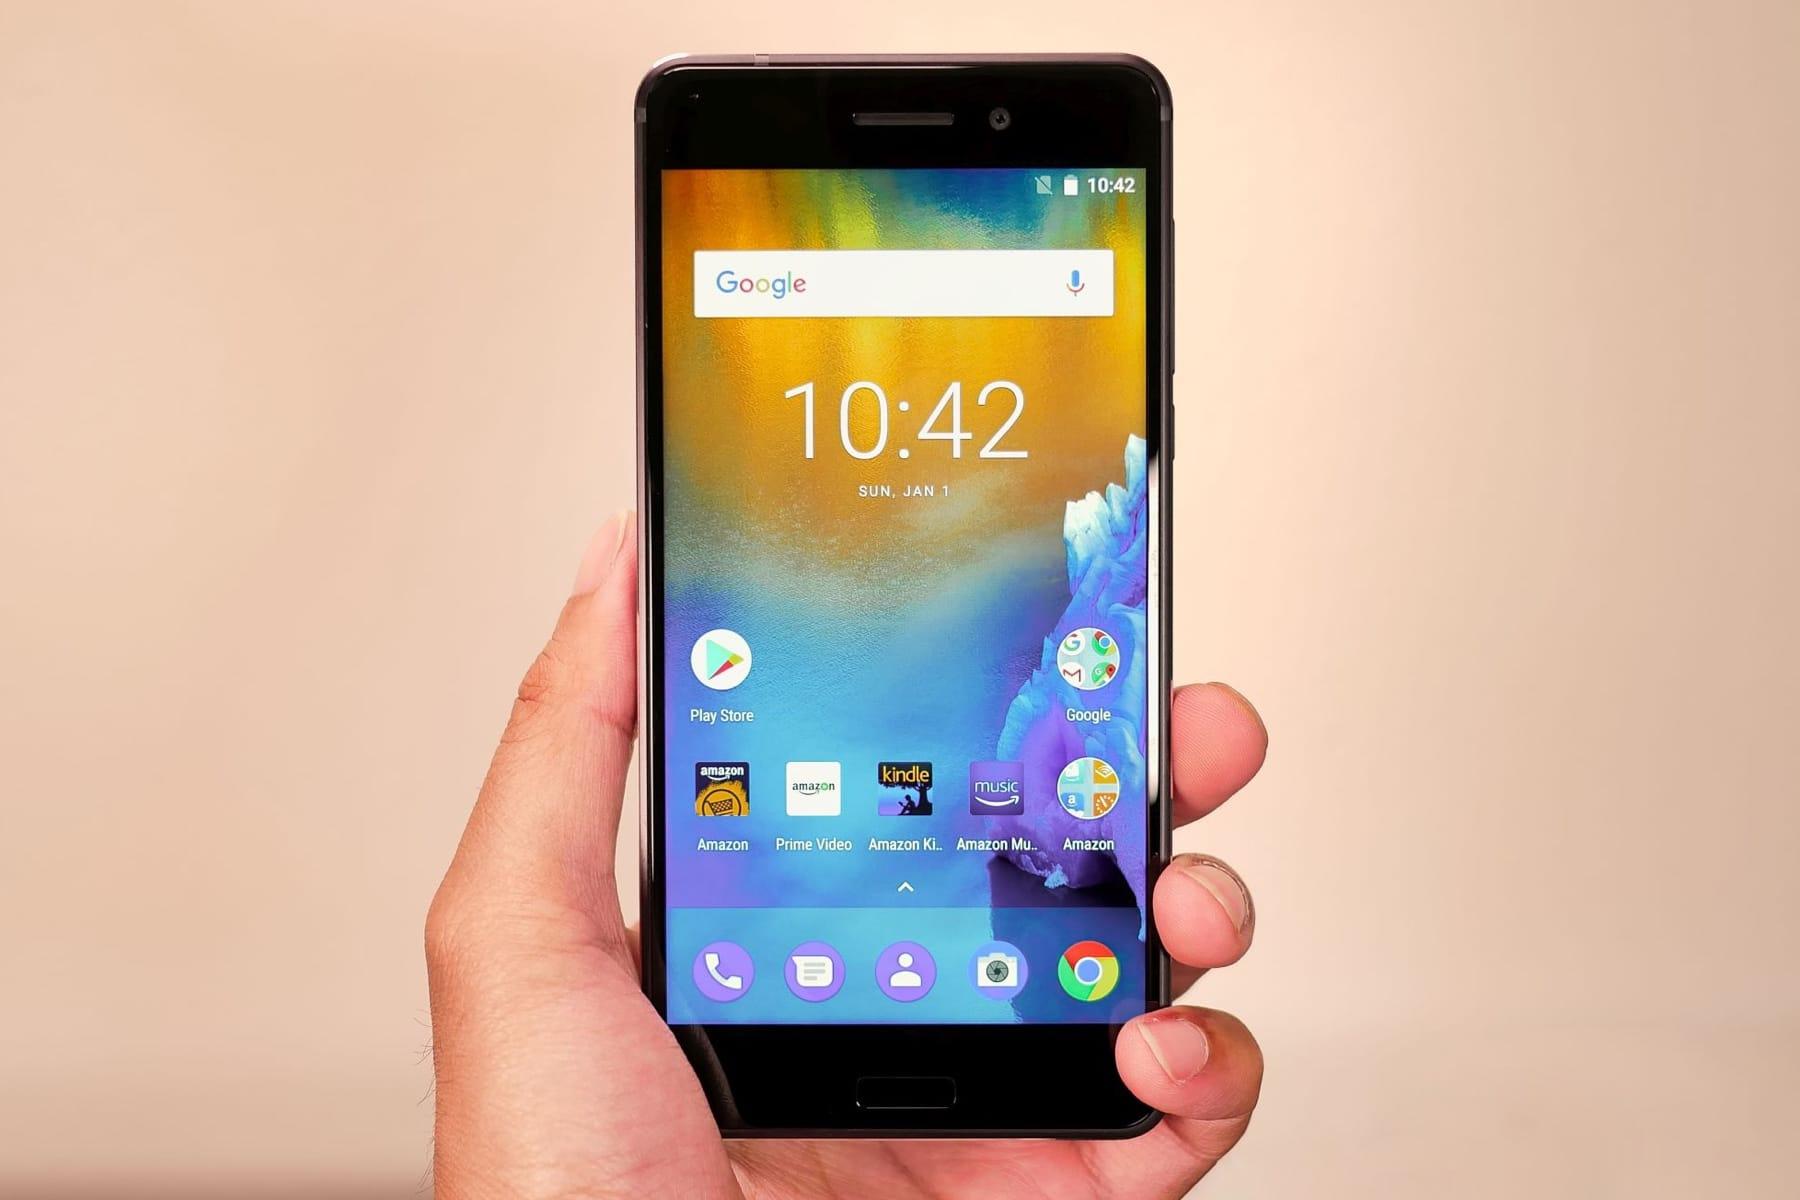 HMD Global готовит квыпуску безрамочный смартфон нокиа  6